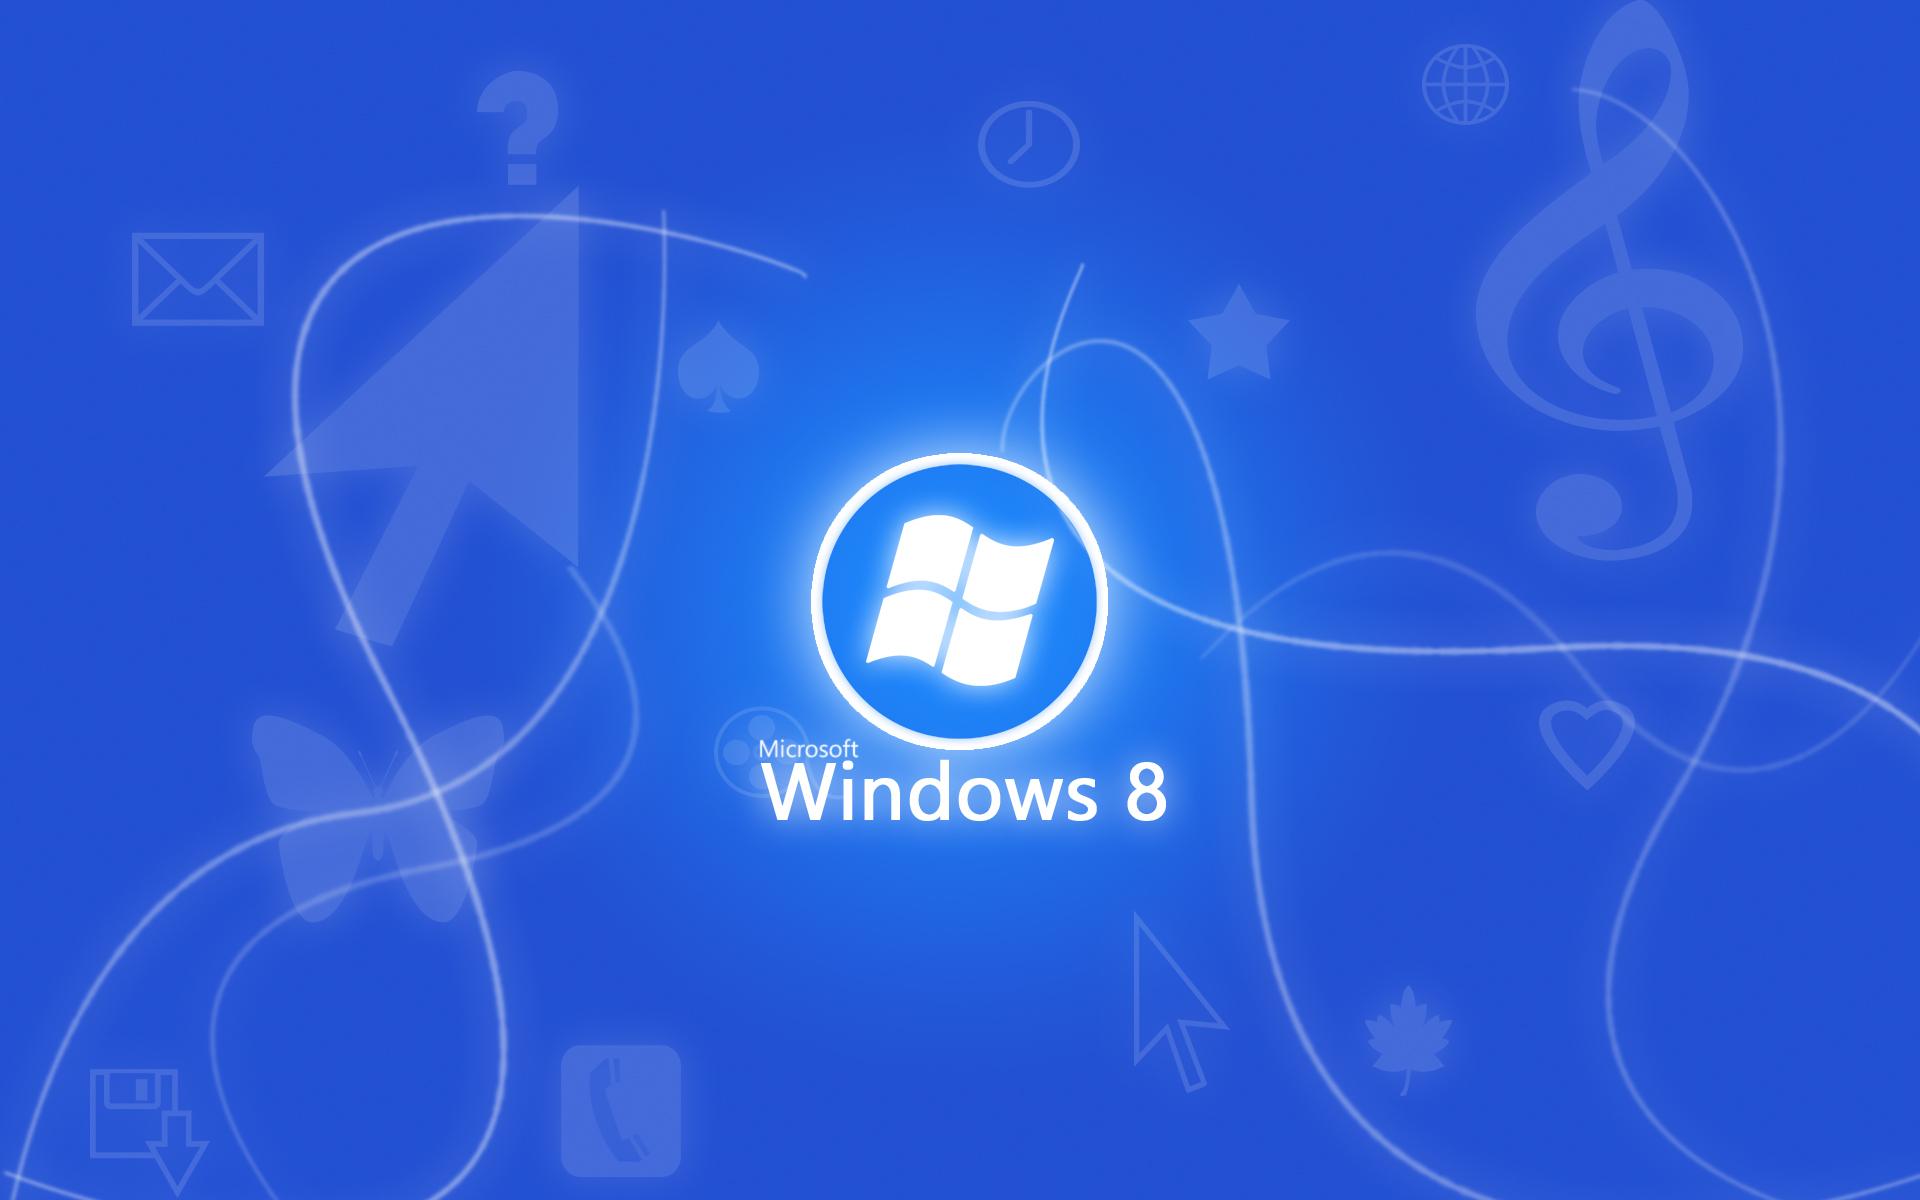 windows 8 hd wallpaper | hintergrund | 1920x1200 | id:279467